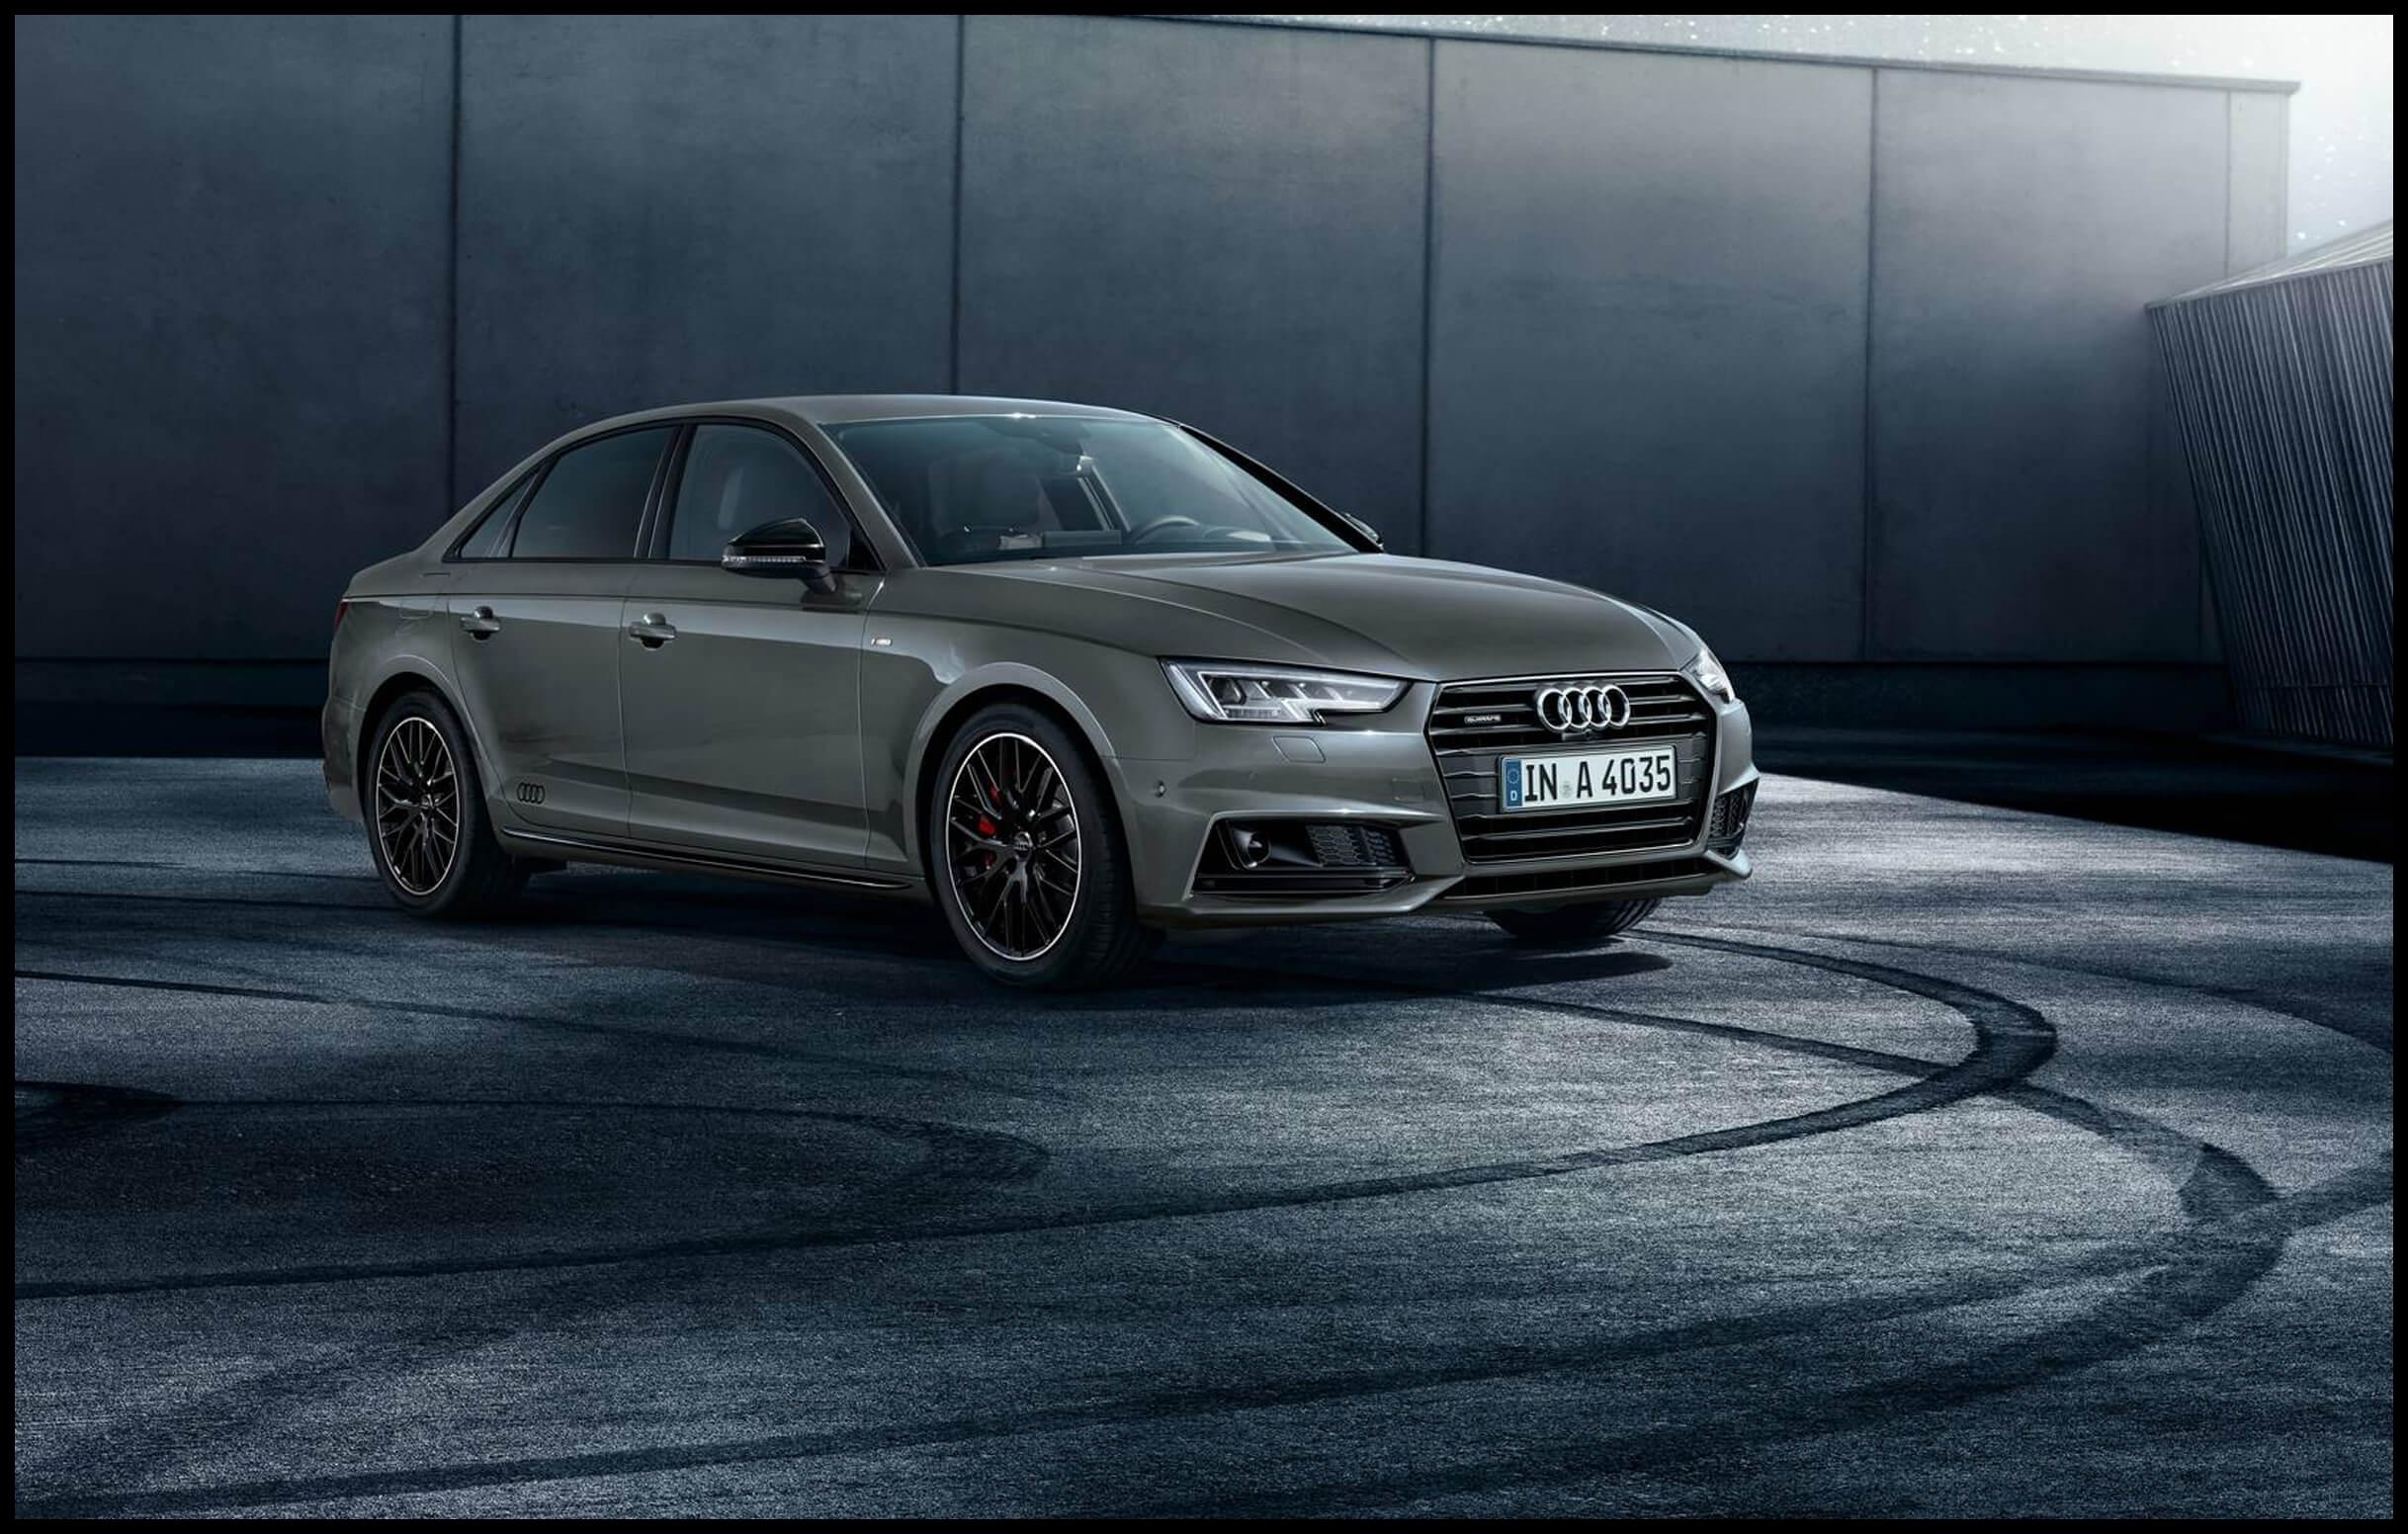 Audi A4 Saloon Black Edition trim